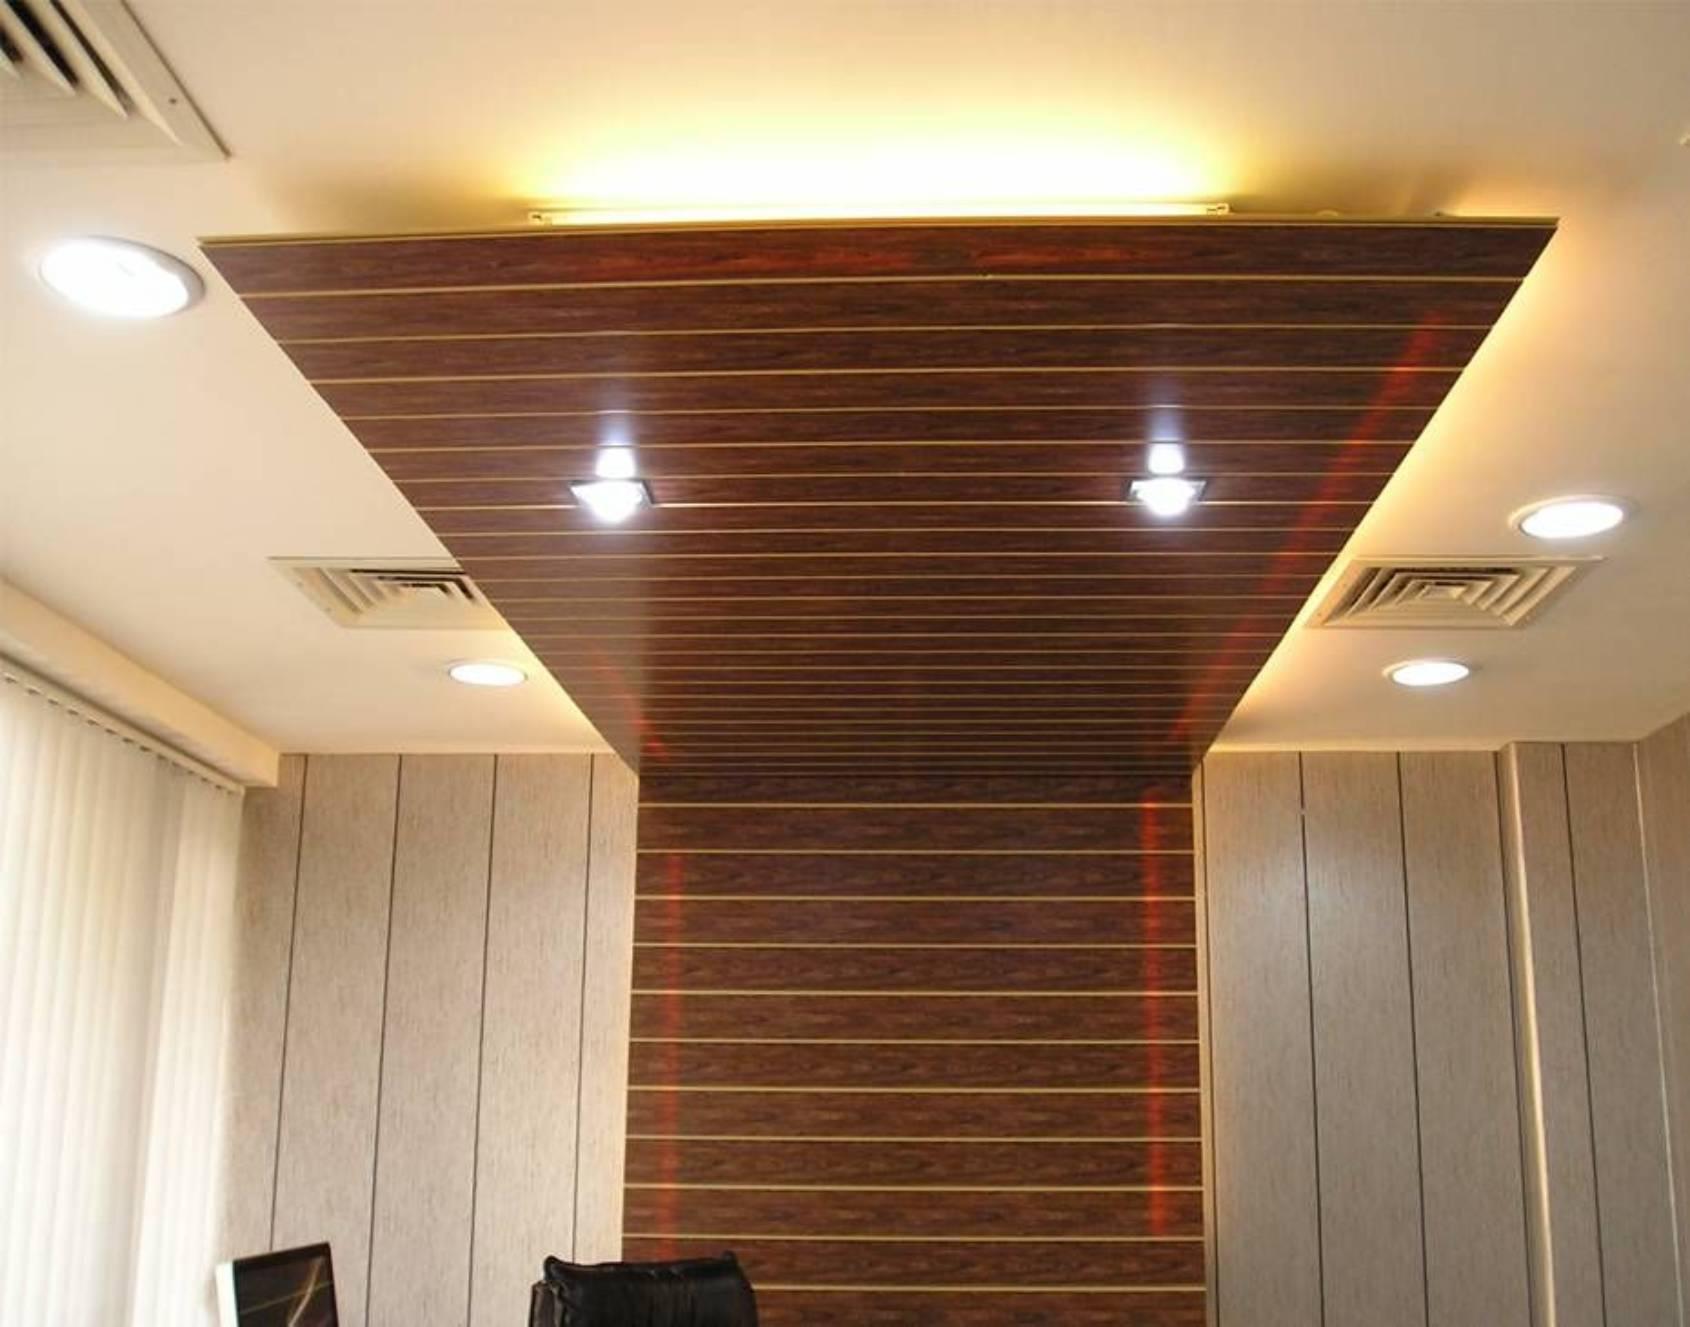 PVC False Ceilings Panels